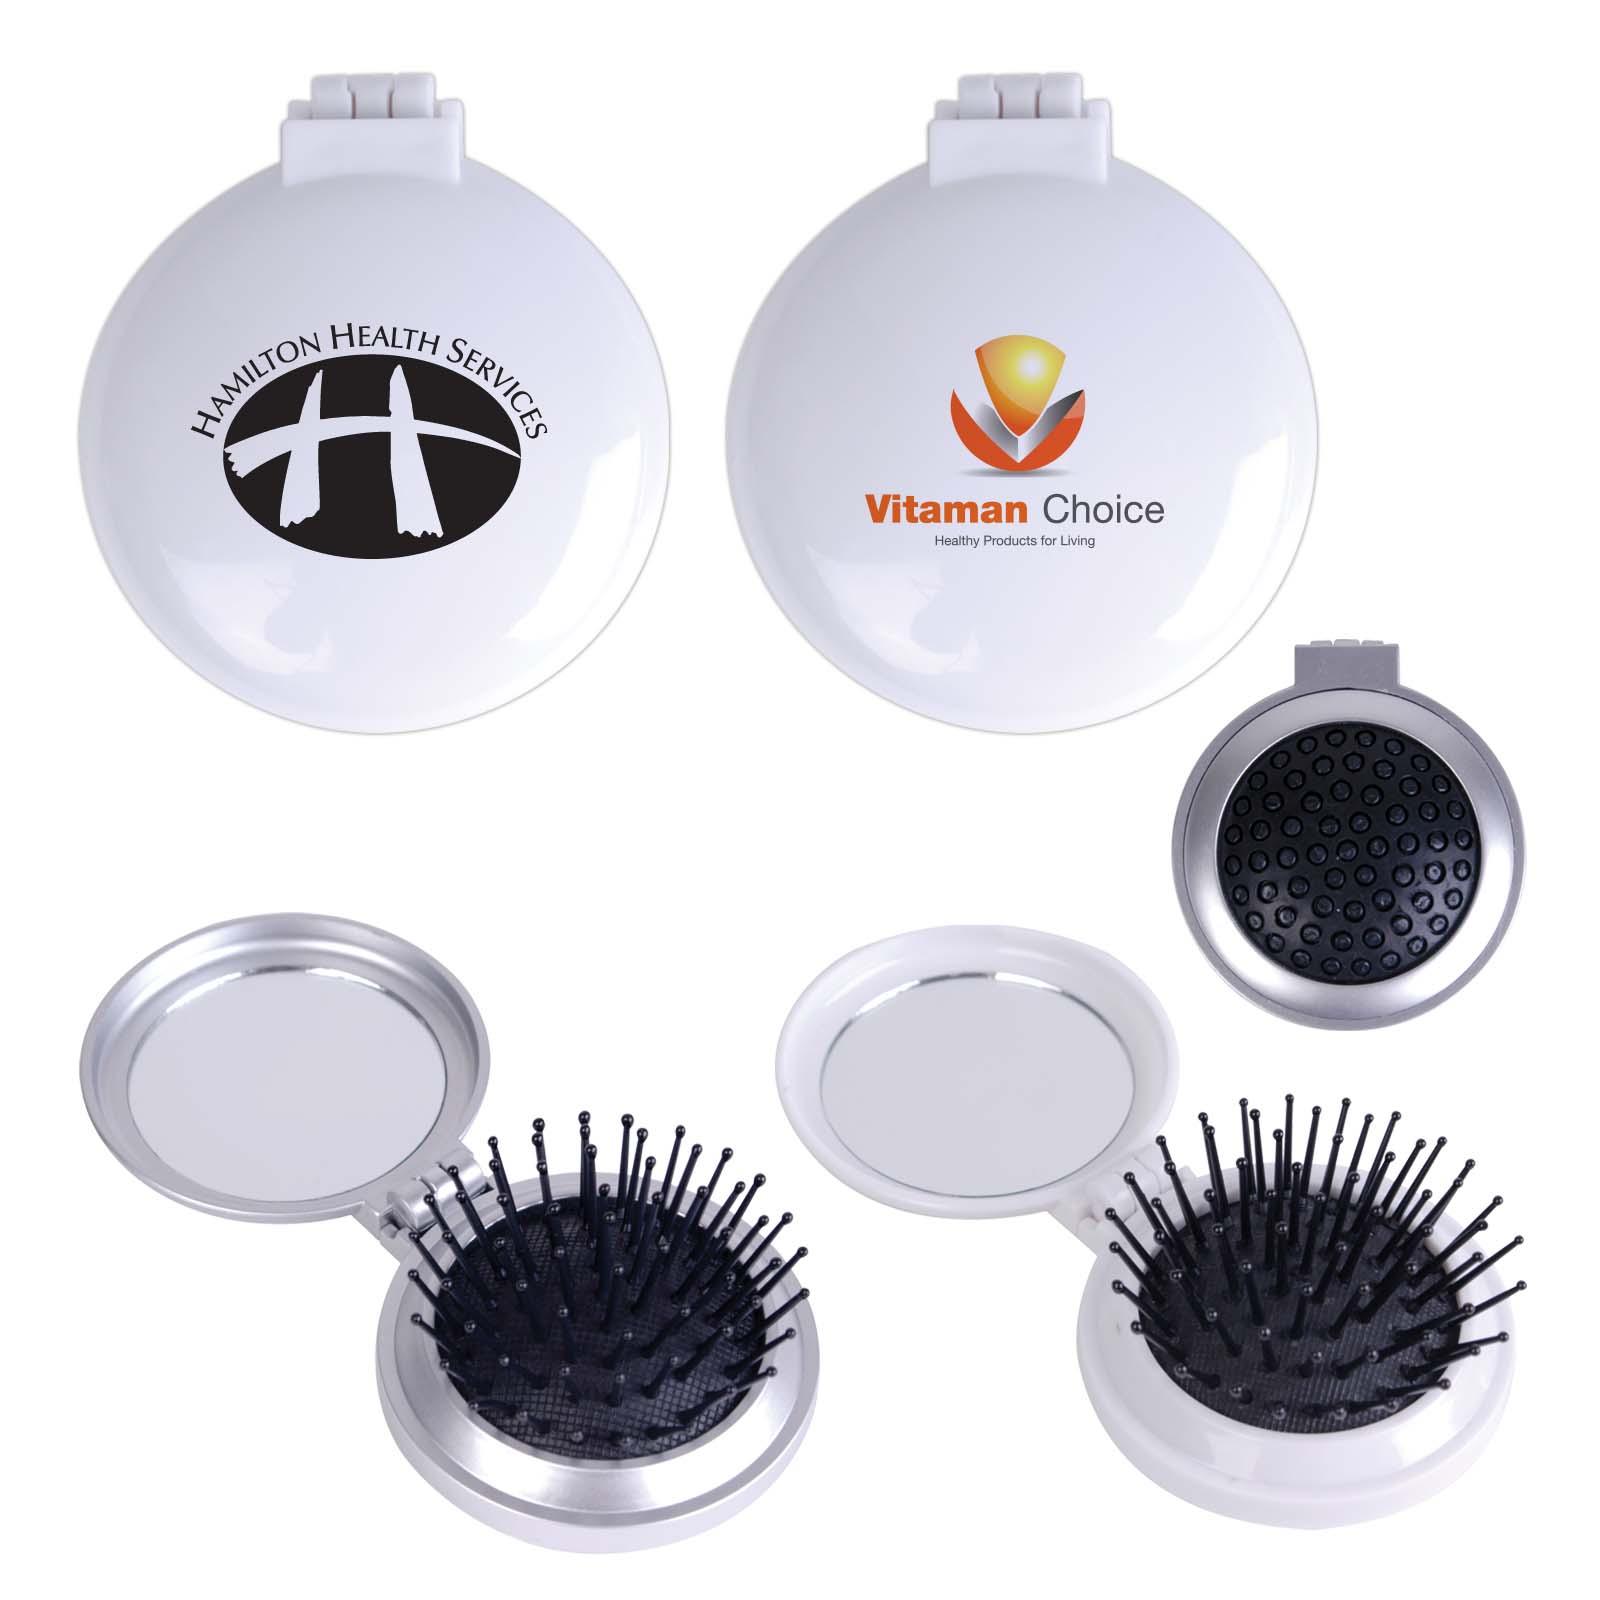 Compact Pop Up Brush / Mirror Set